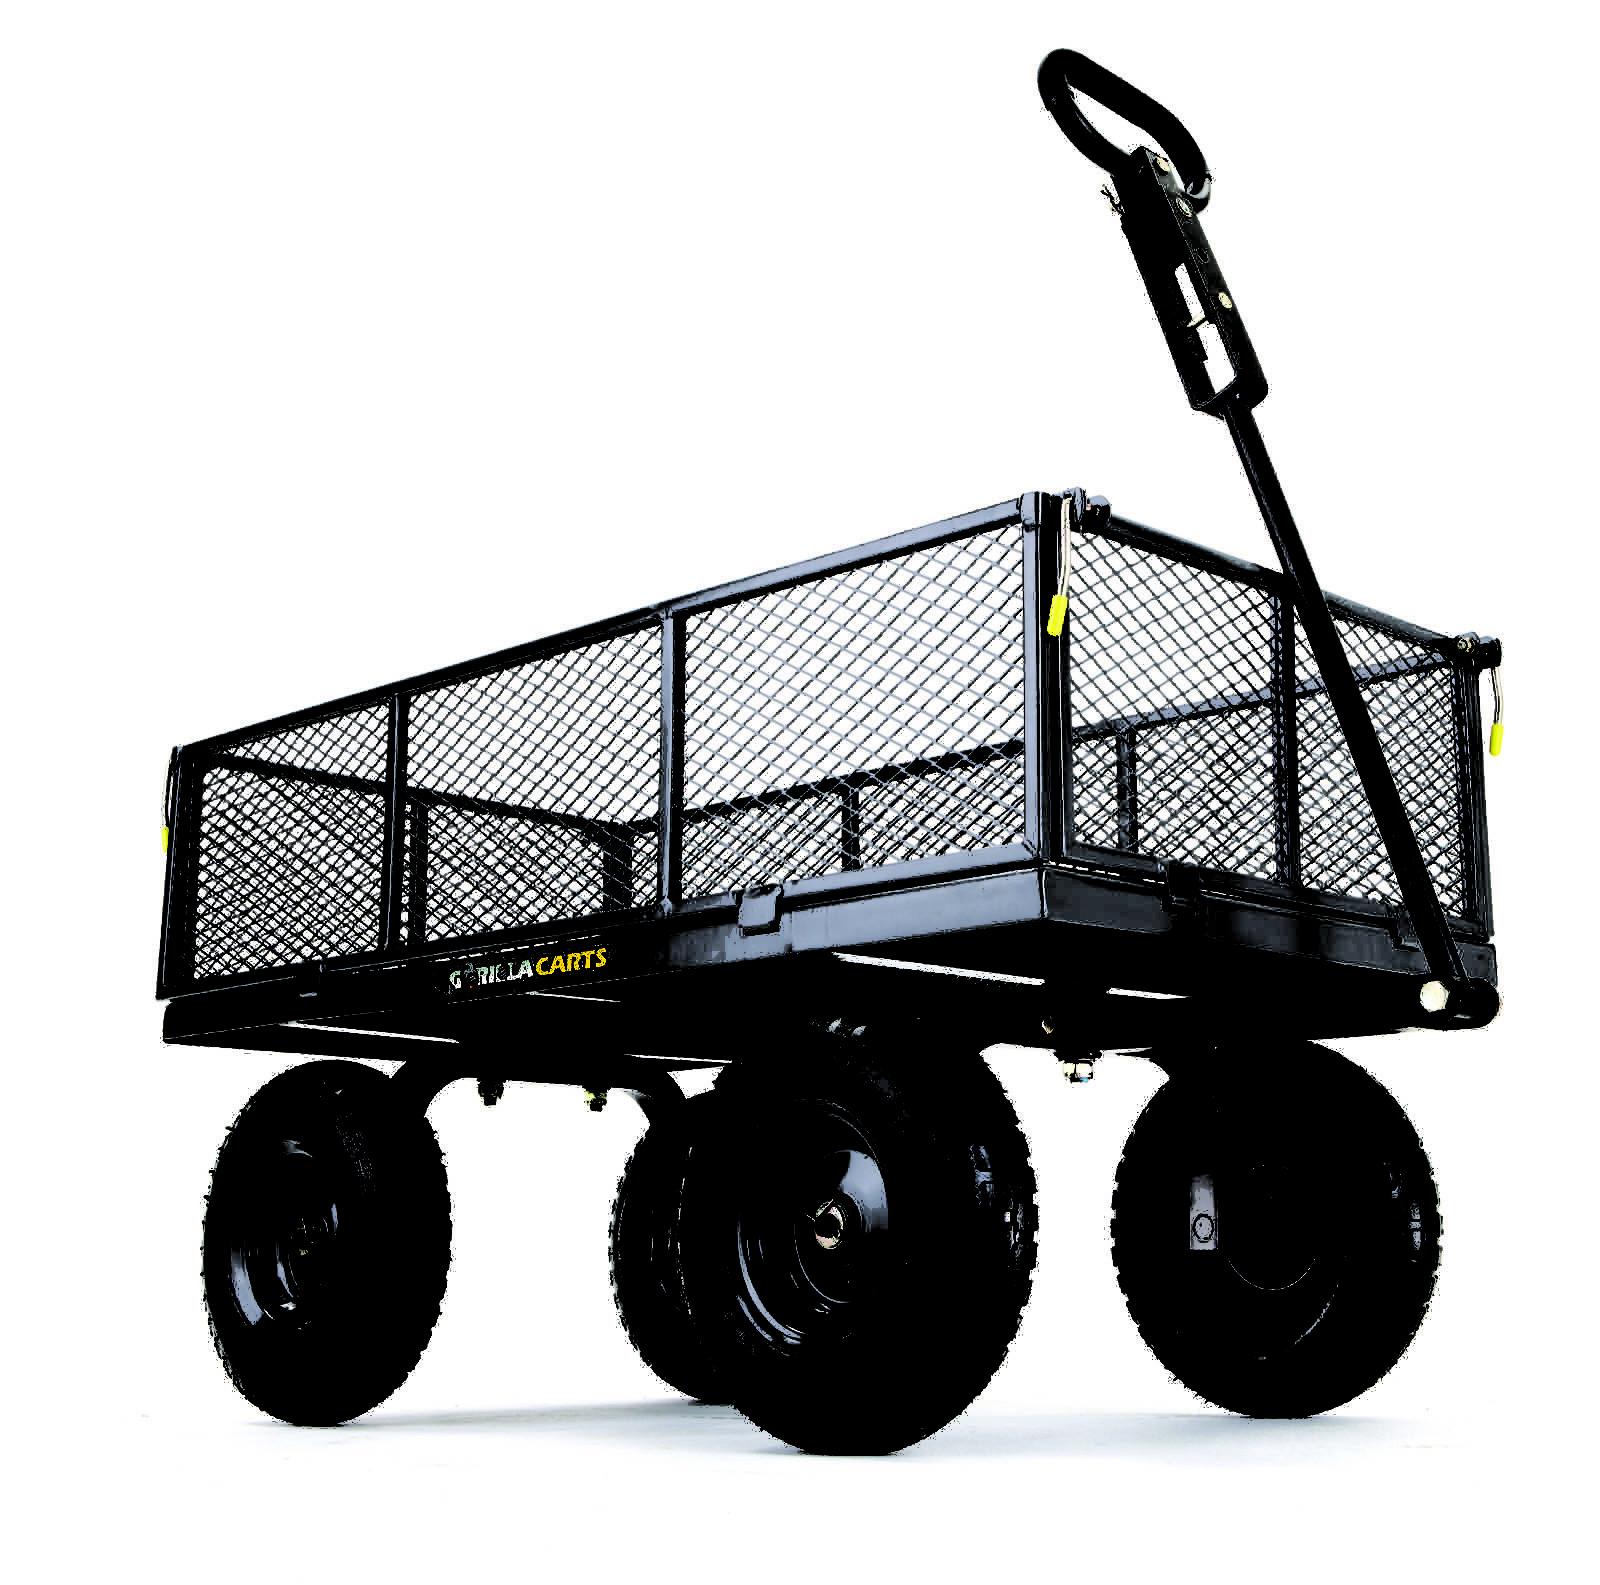 Gor1000ps C Gorilla Carts